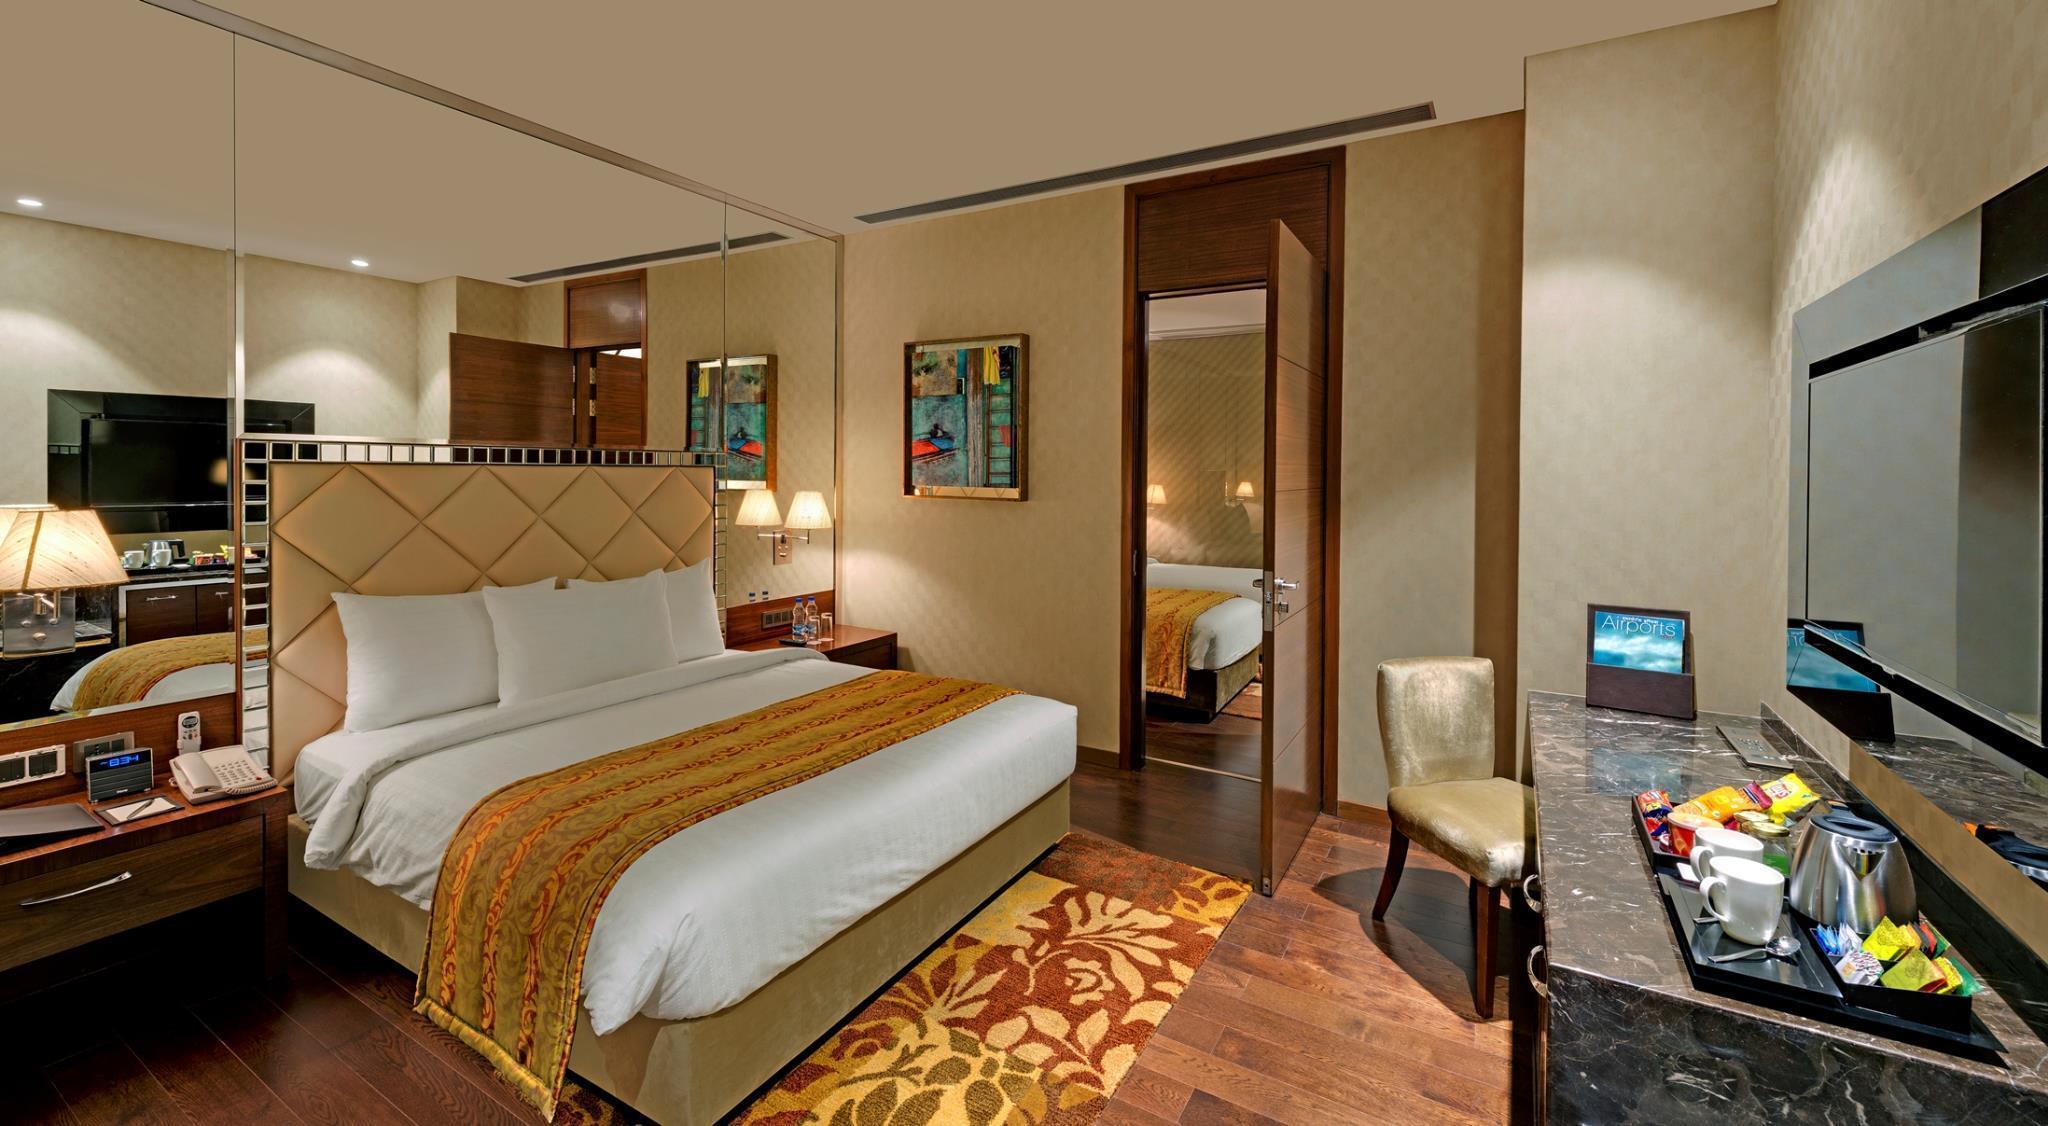 Niranta Transit Hotel Mumbai Airport,Bandra Fort